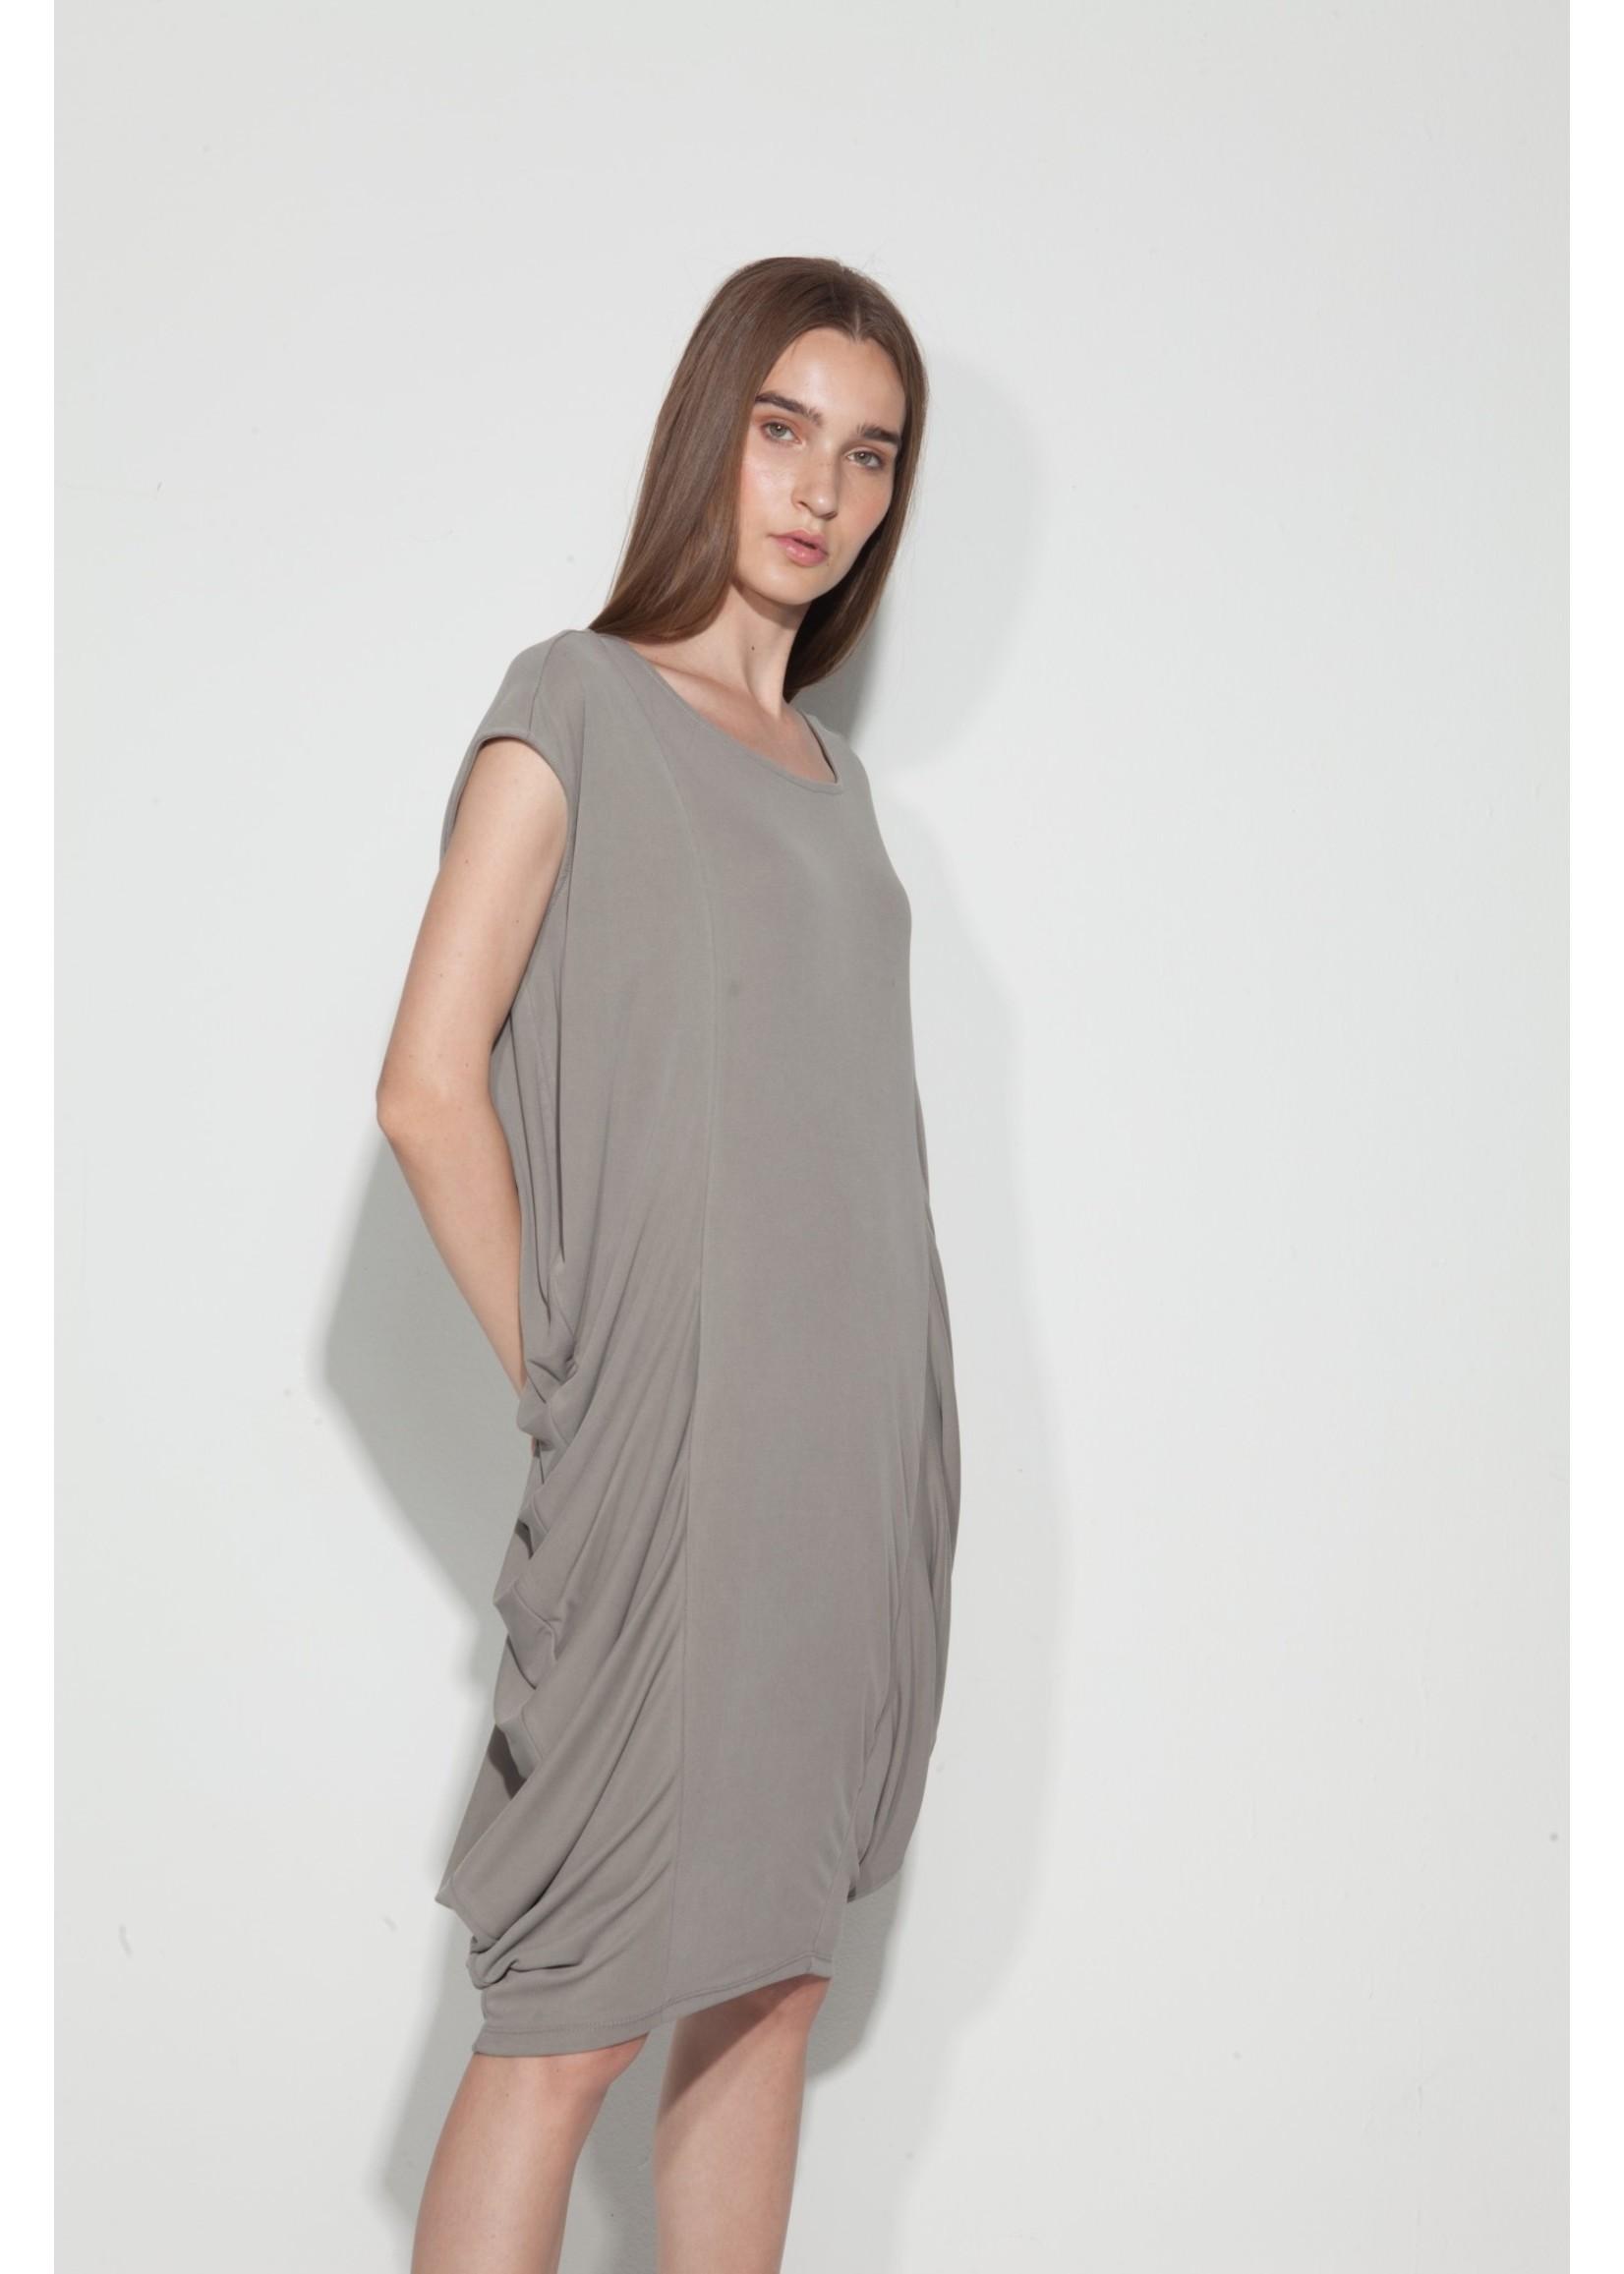 OZAI headline dress